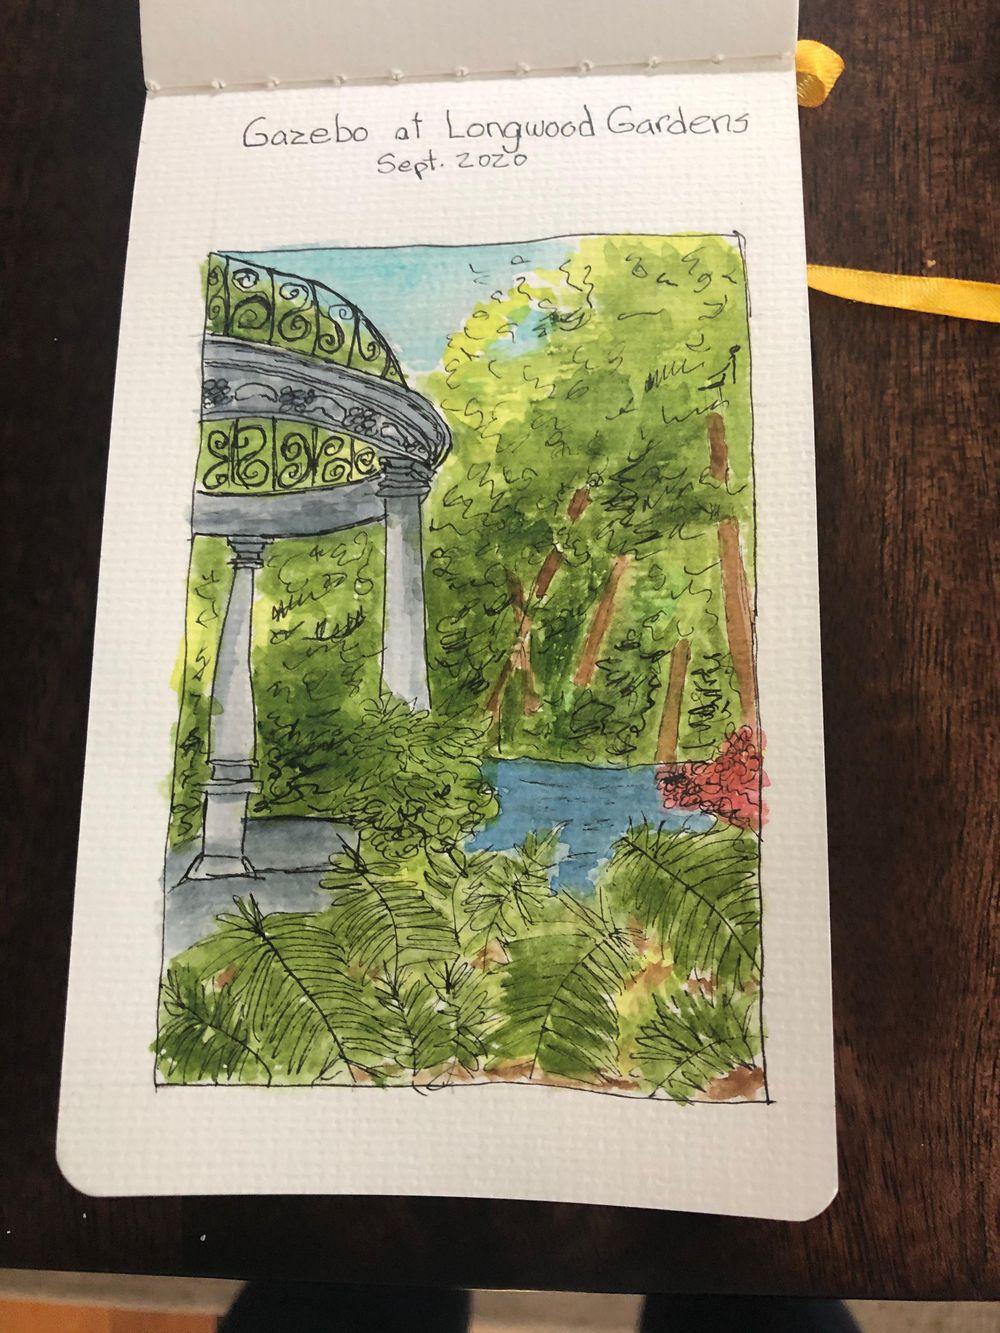 Gazebo Scene at Longwood Gardens - image 1 - student project